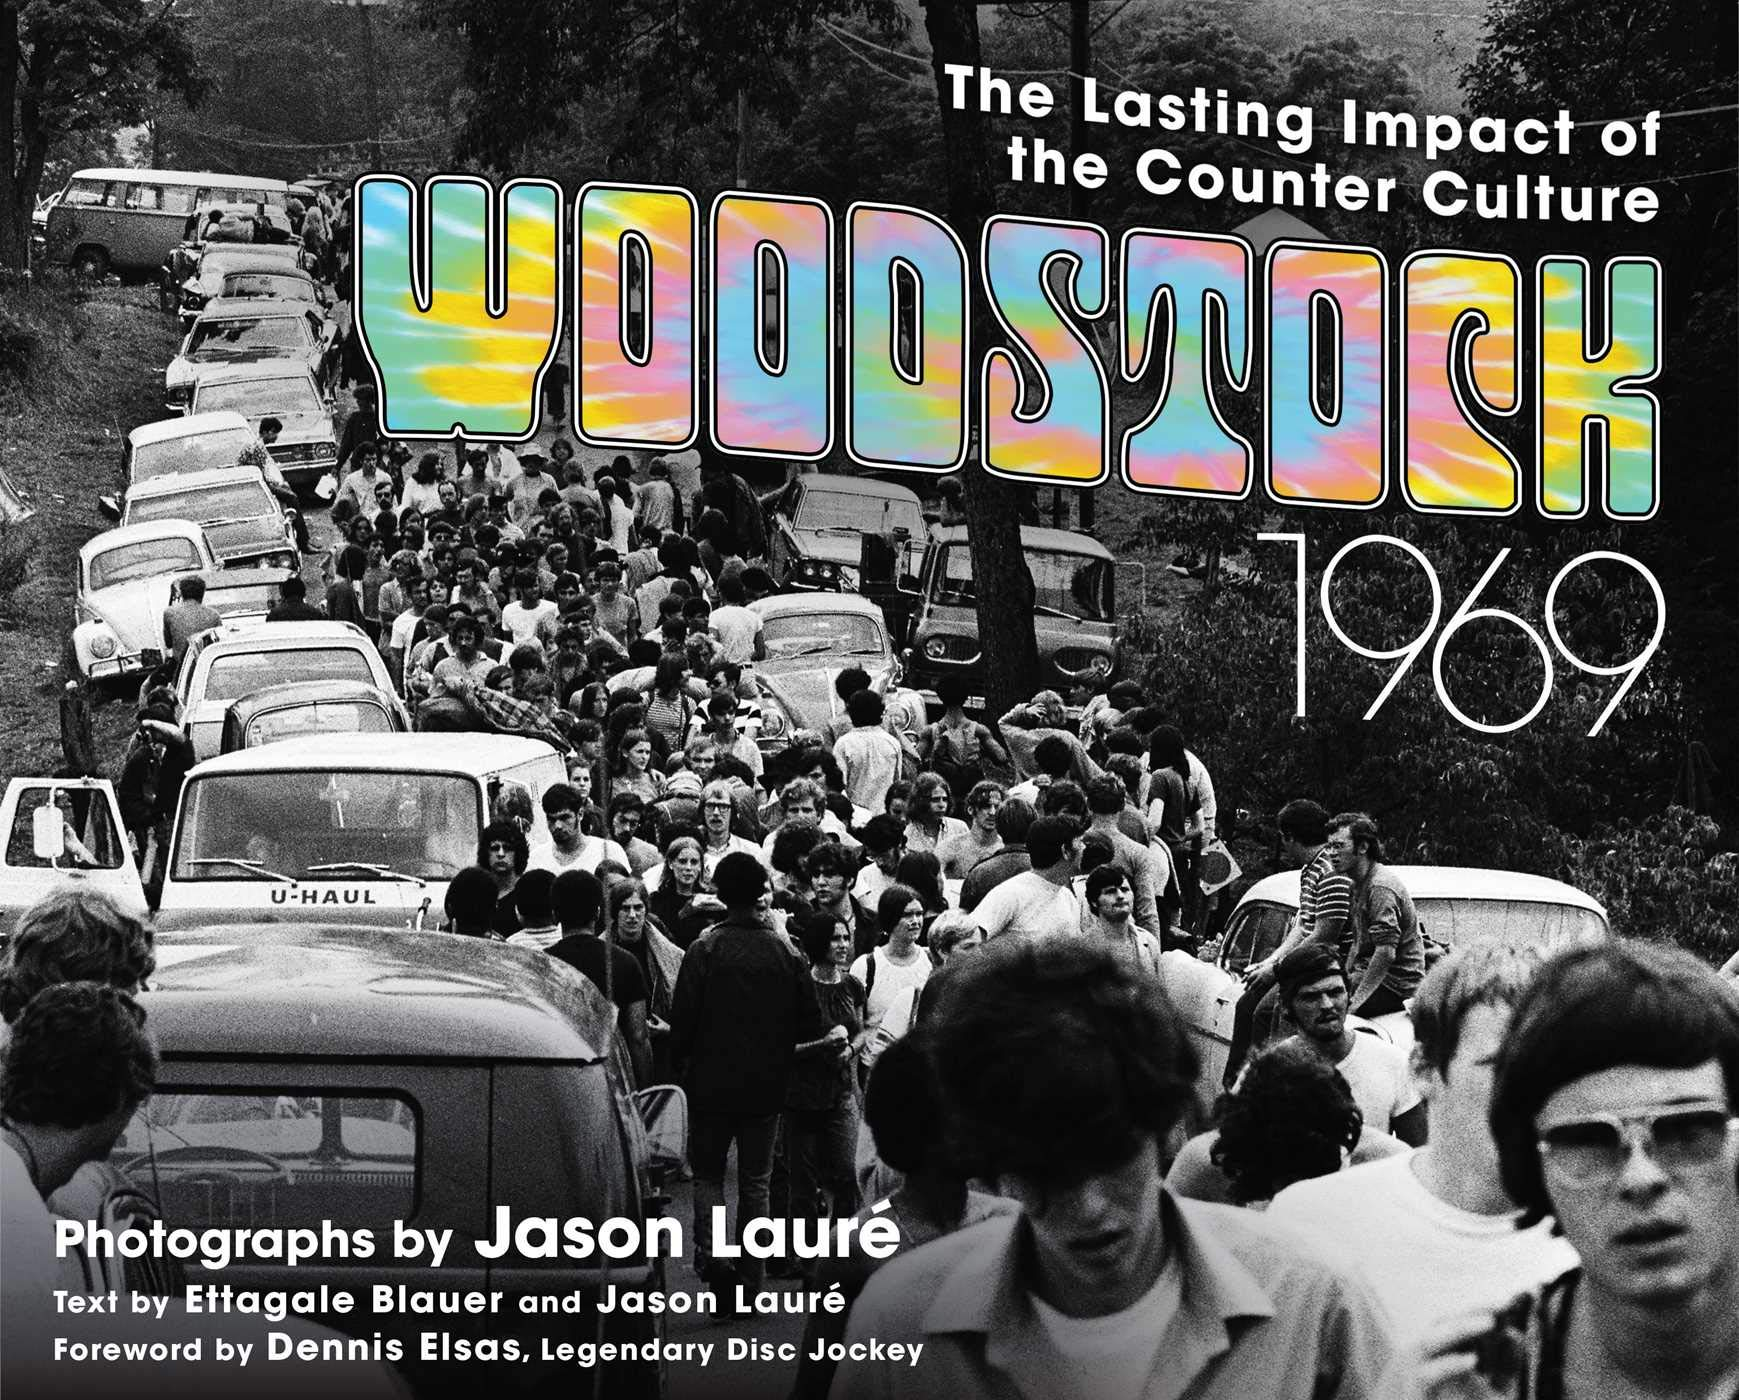 Amazon.com: Woodstock 1969: The Lasting Impact of the ...